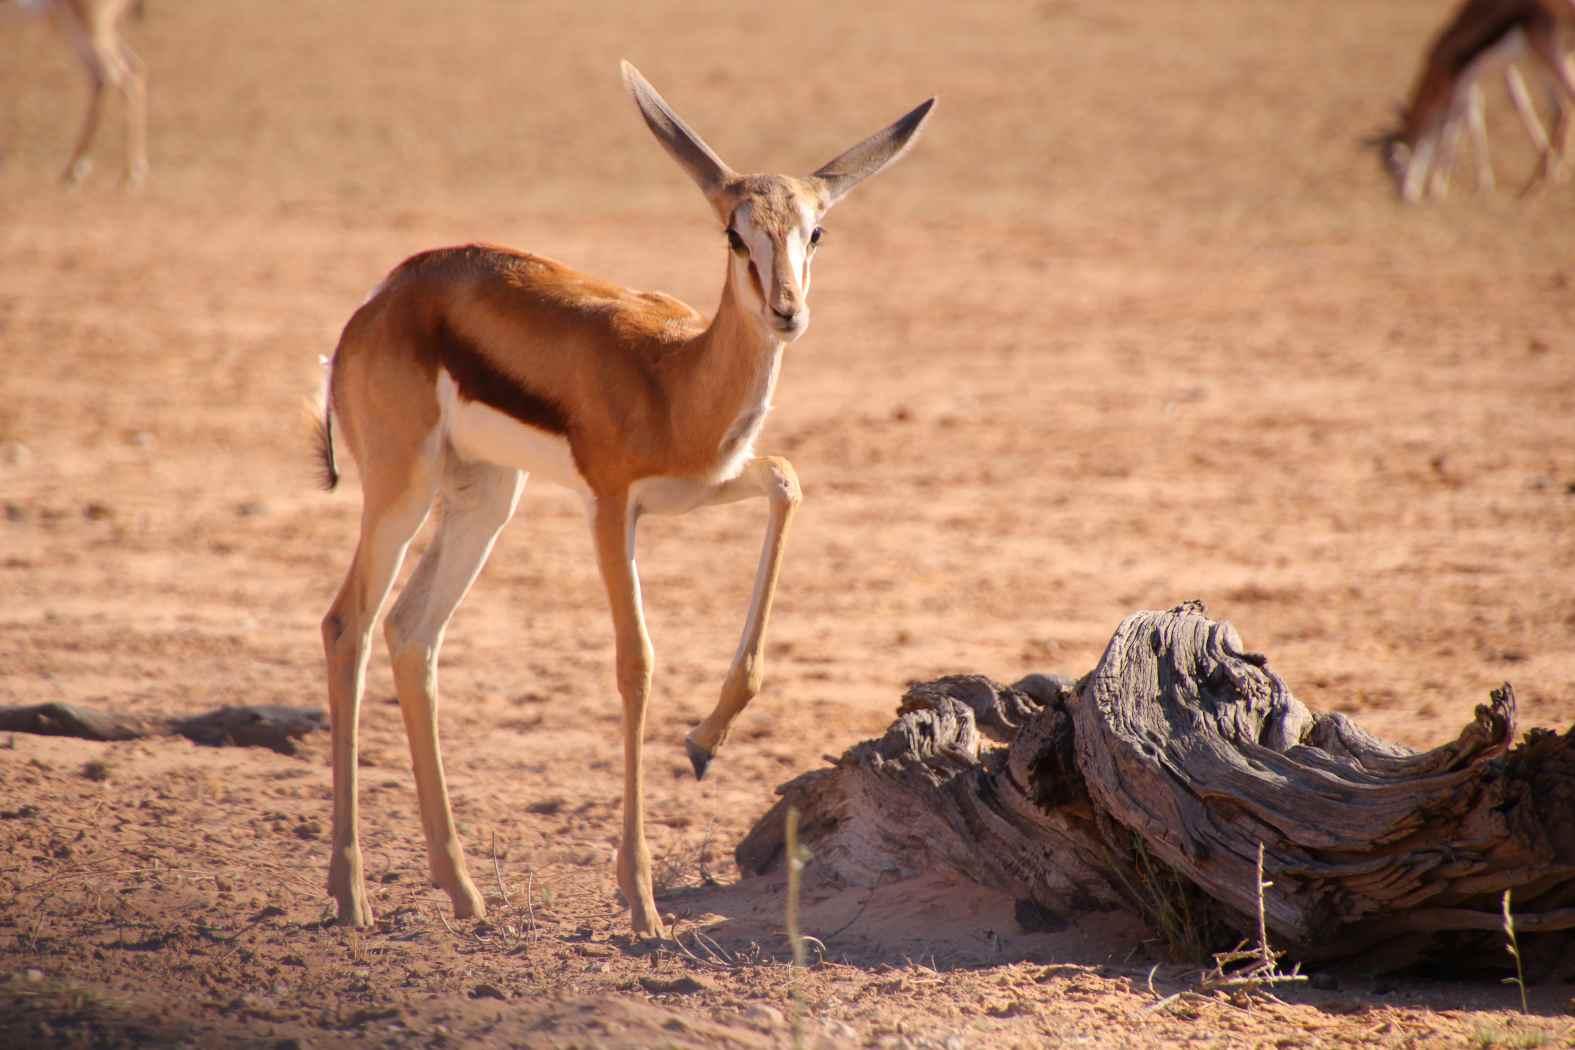 Kgalagadi Transfrontier Park Springbok